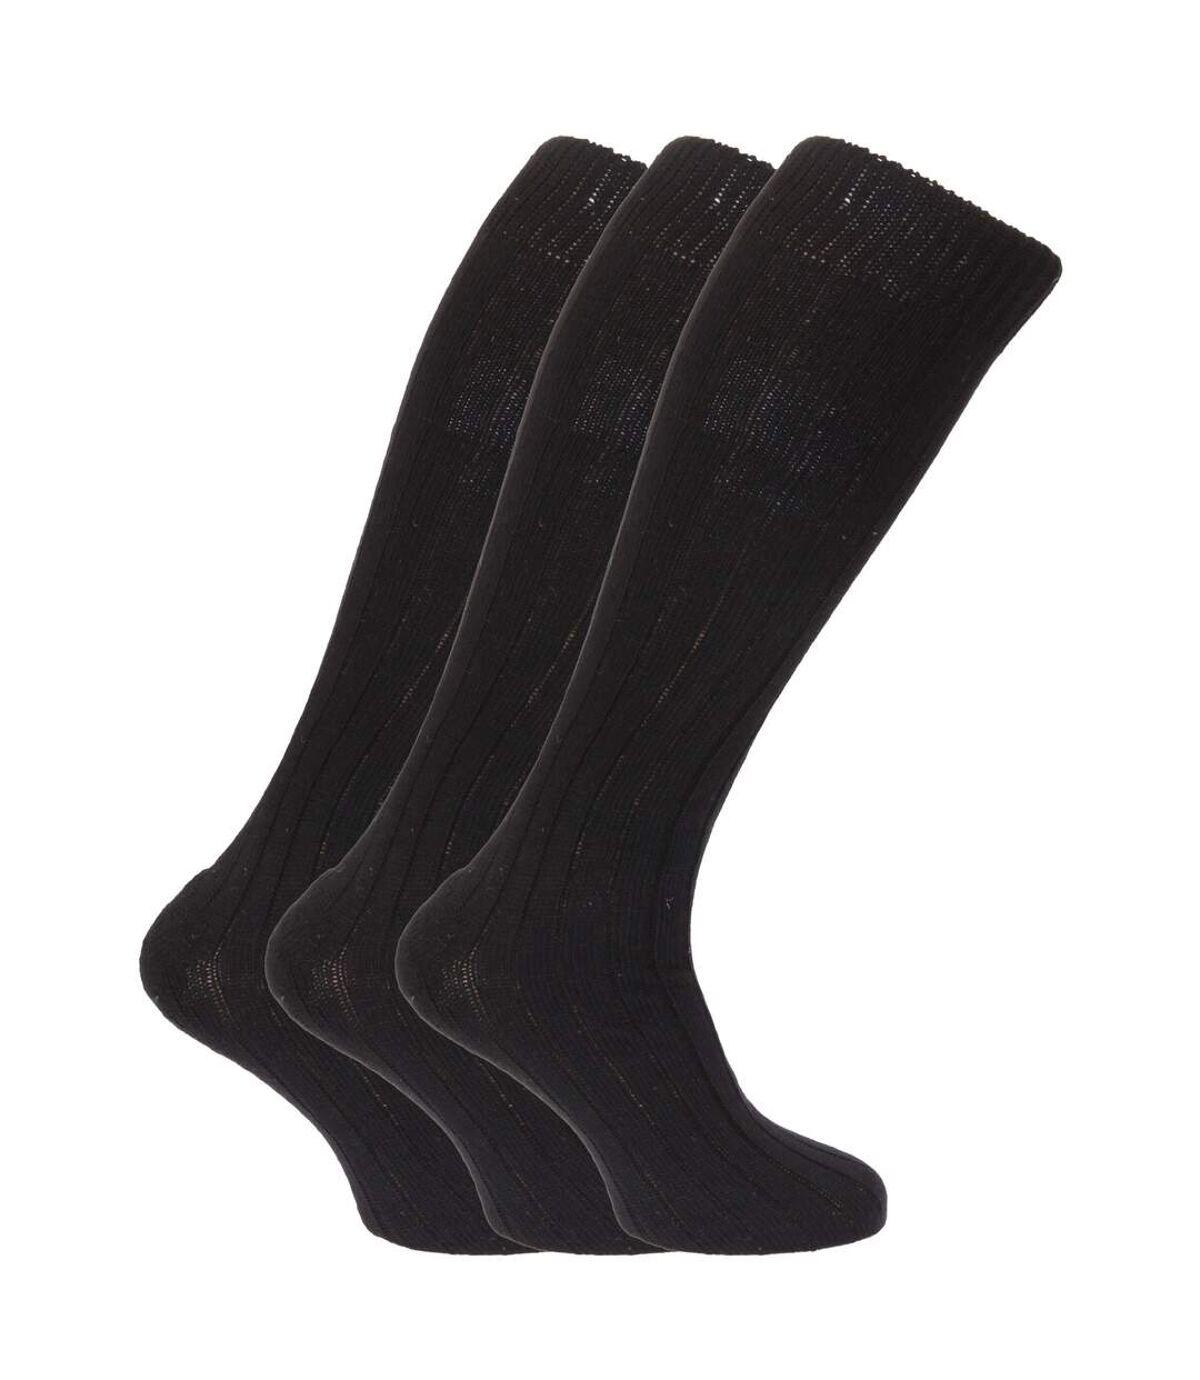 Mens Wool Blend Long Length Socks With Padded Sole (Pack Of 3) (Black) - UTMB160